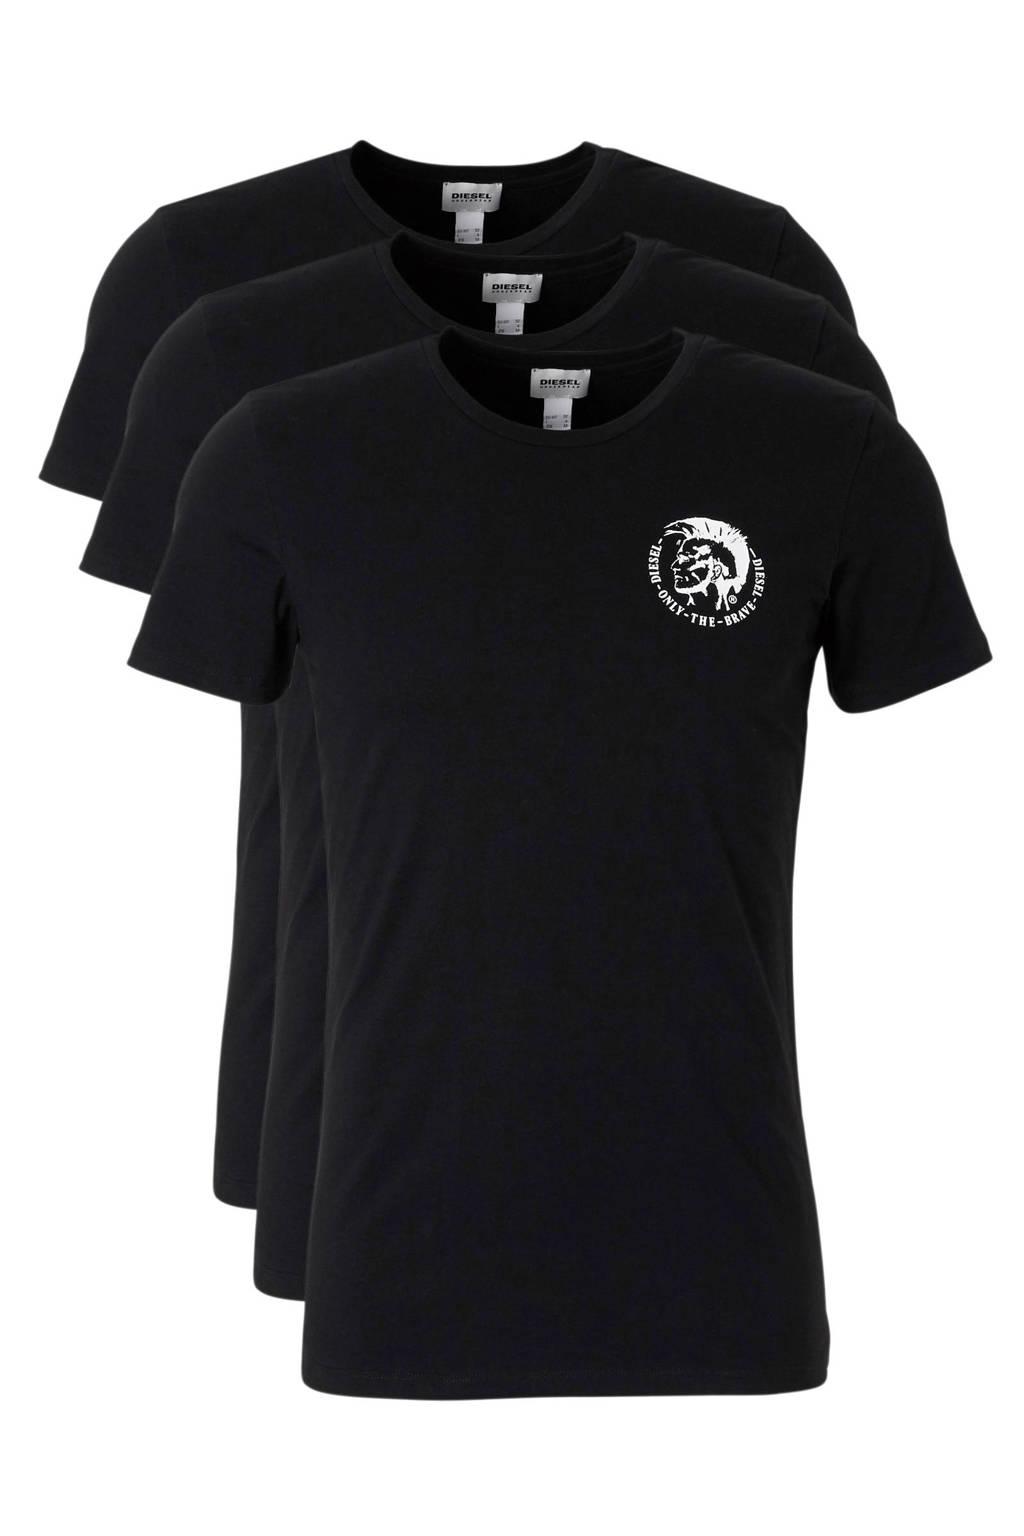 Diesel T-shirt Randal (set van 3), Zwart / Wit